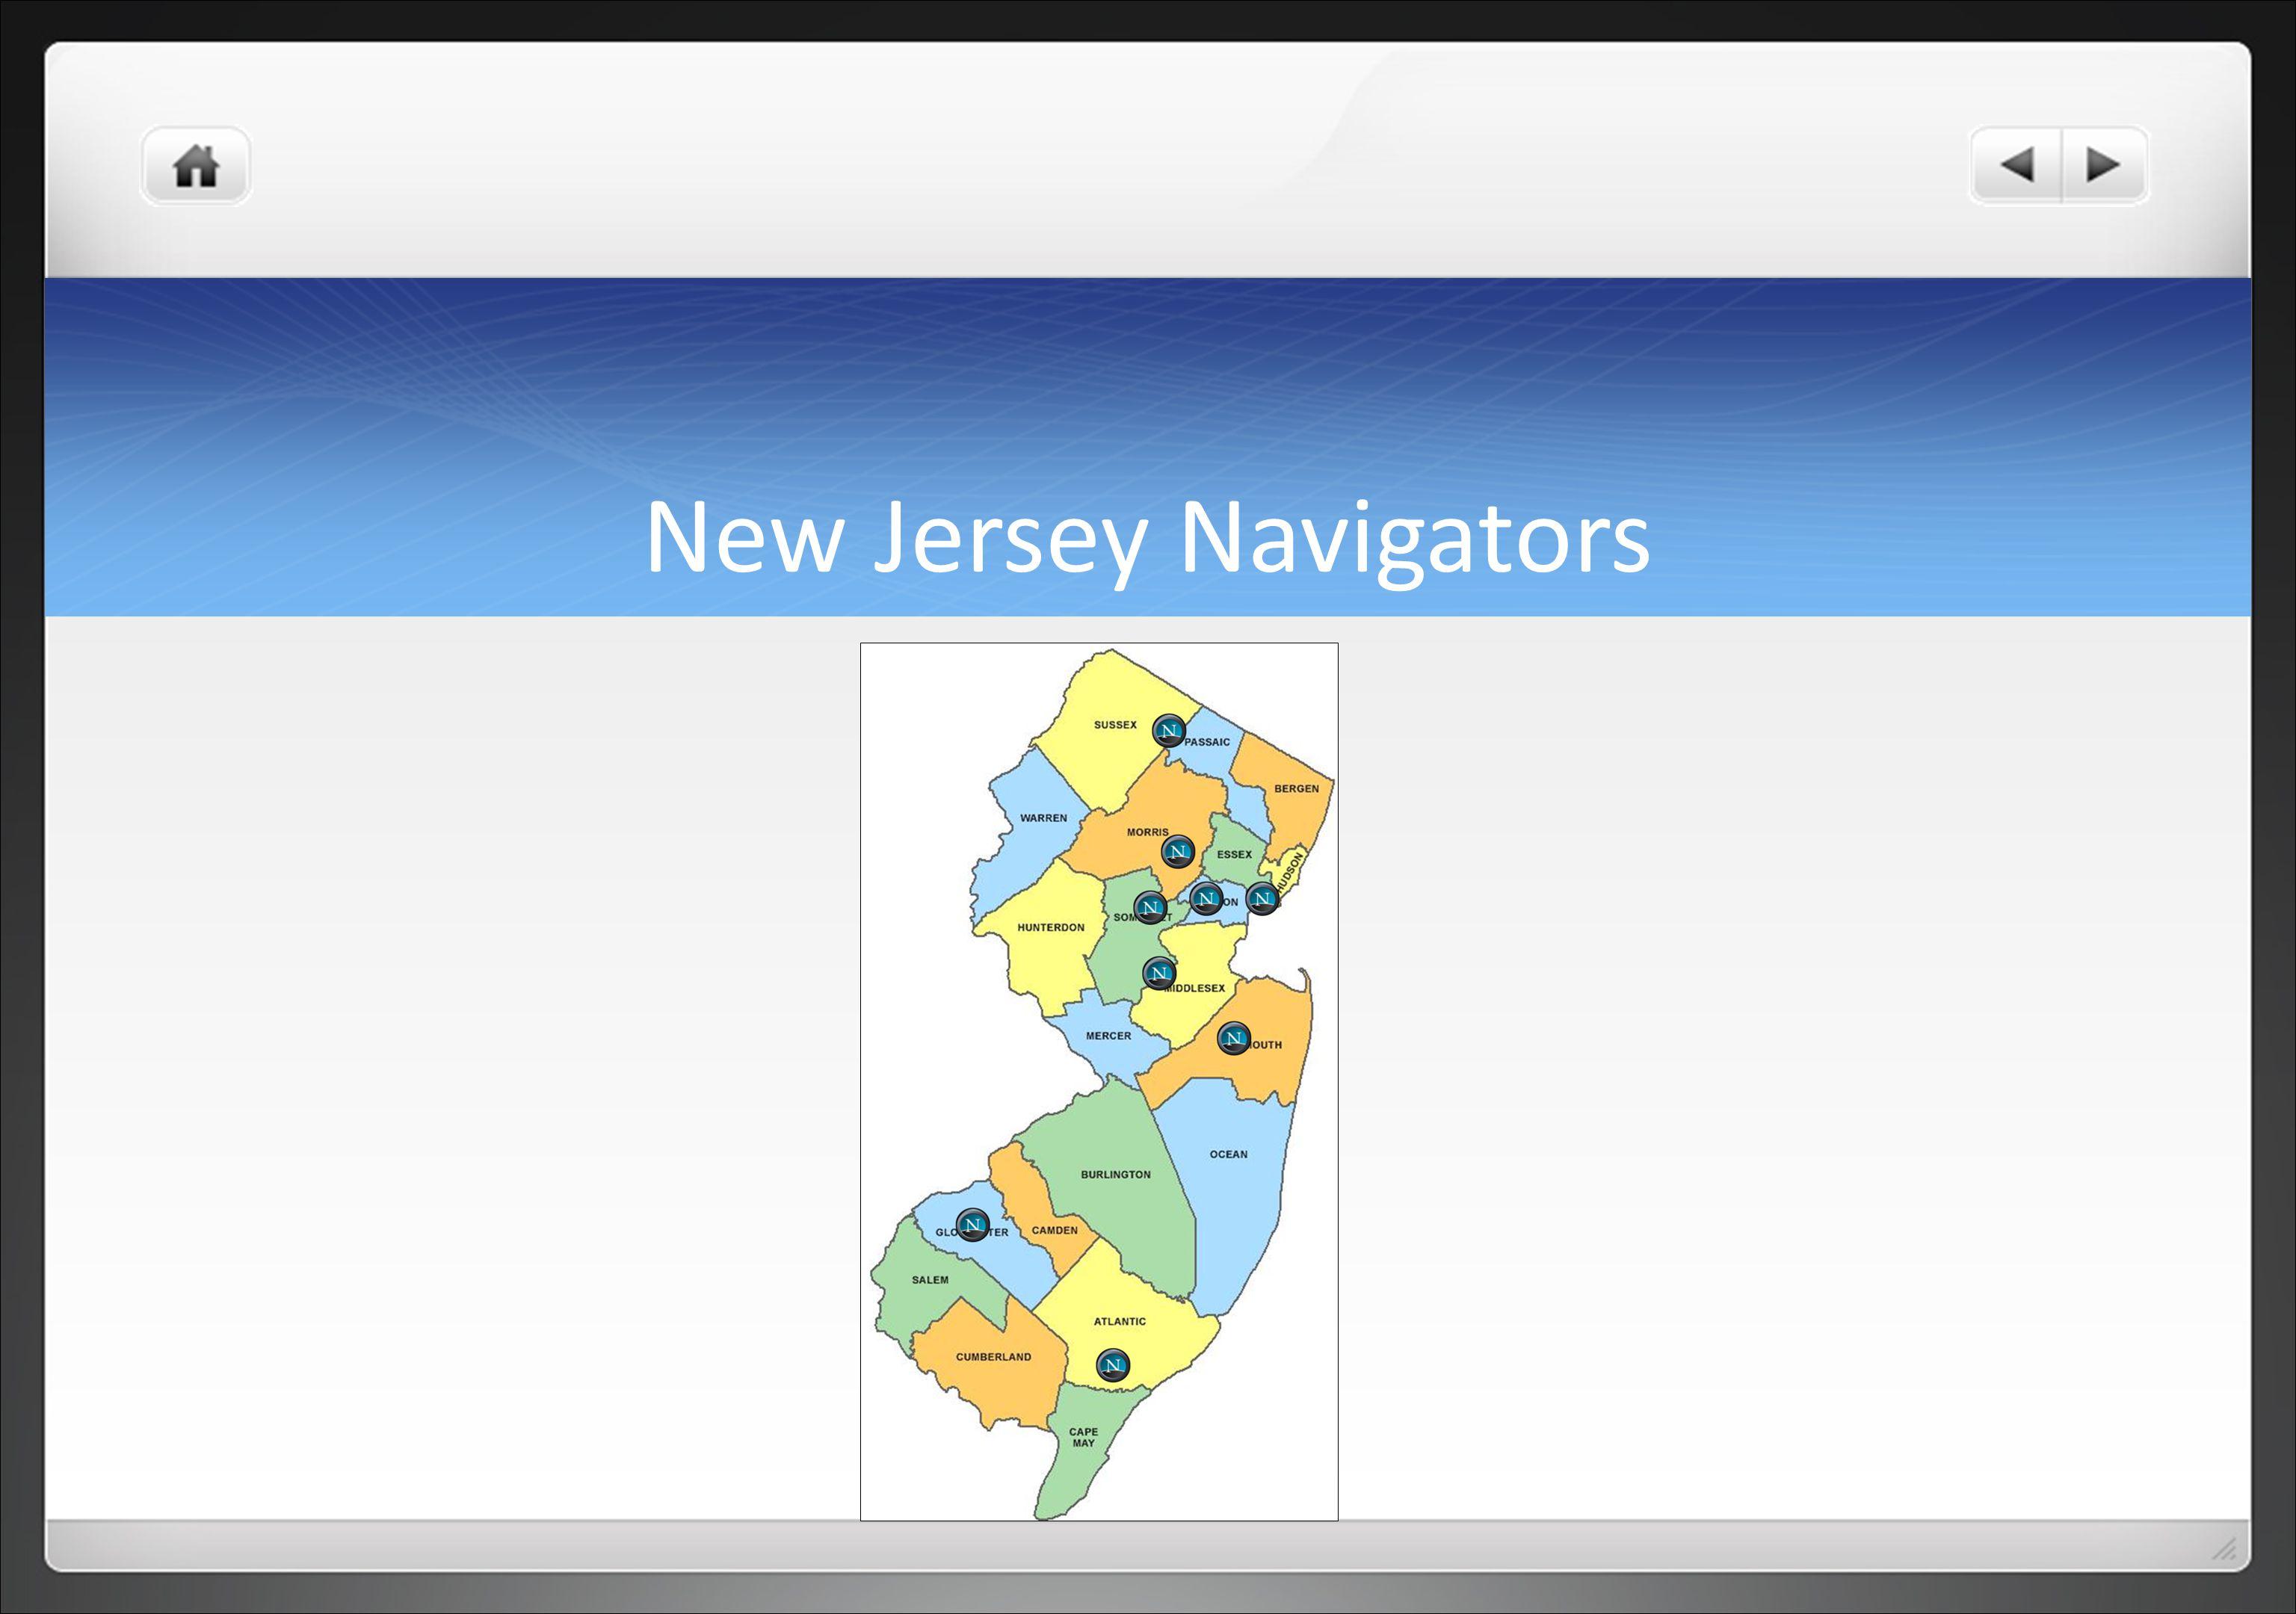 New Jersey Navigators